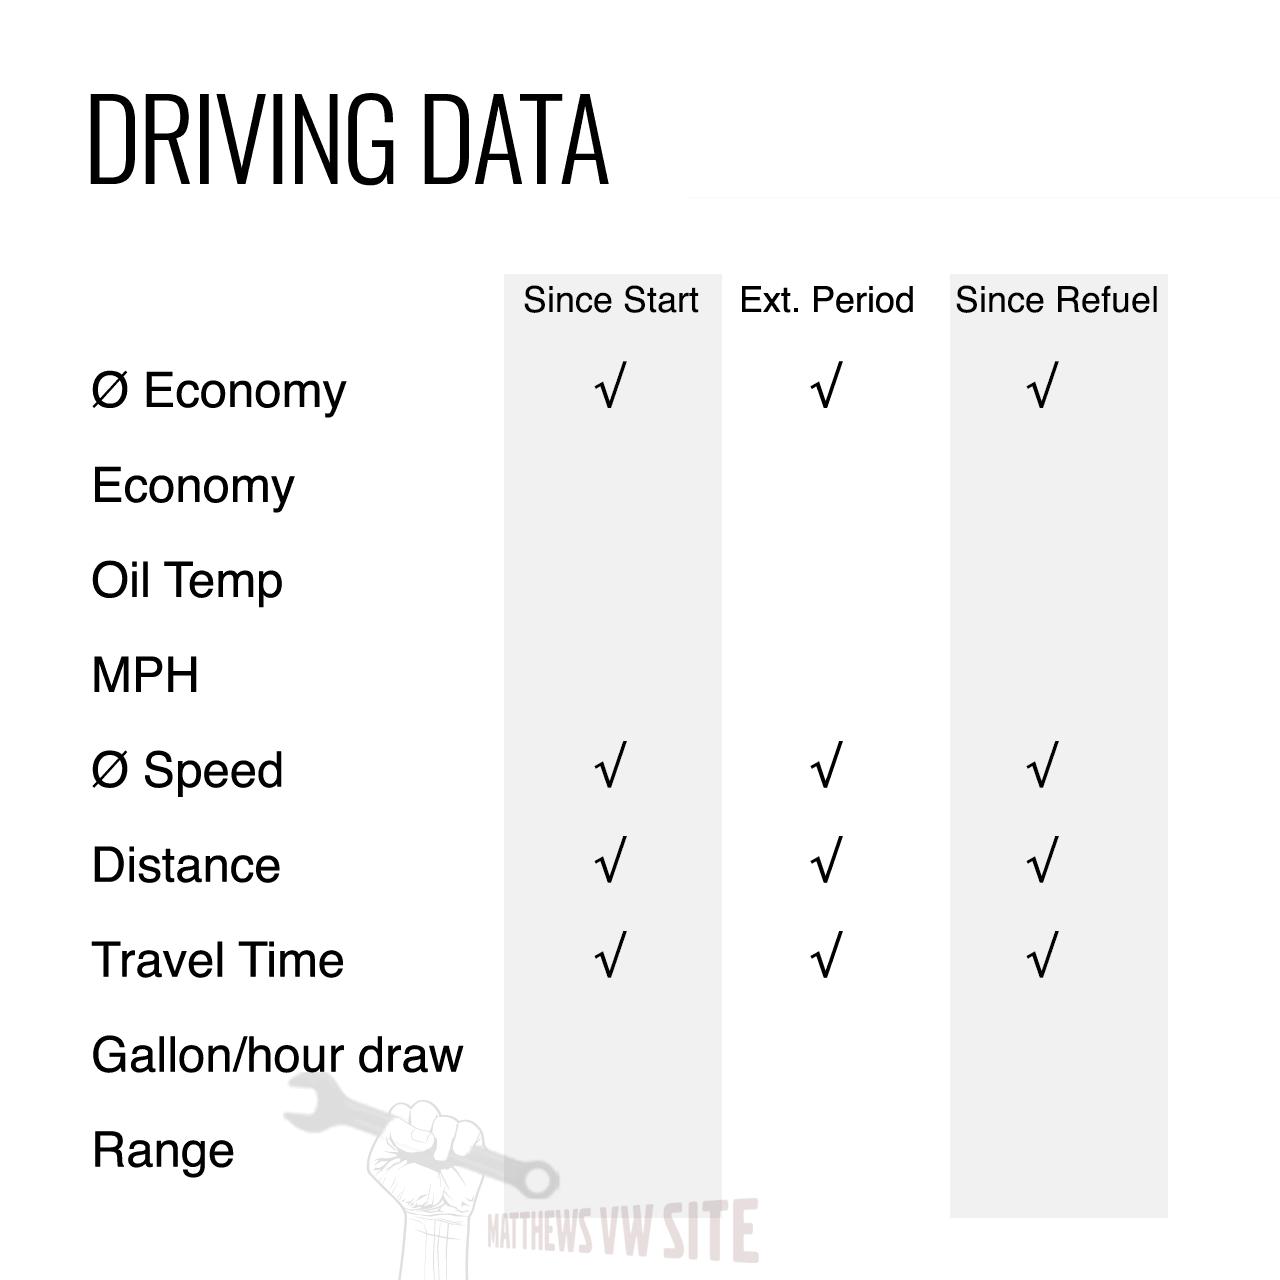 driving data golf info display 1 - Volkswagen Multifunction Display - Driving Data